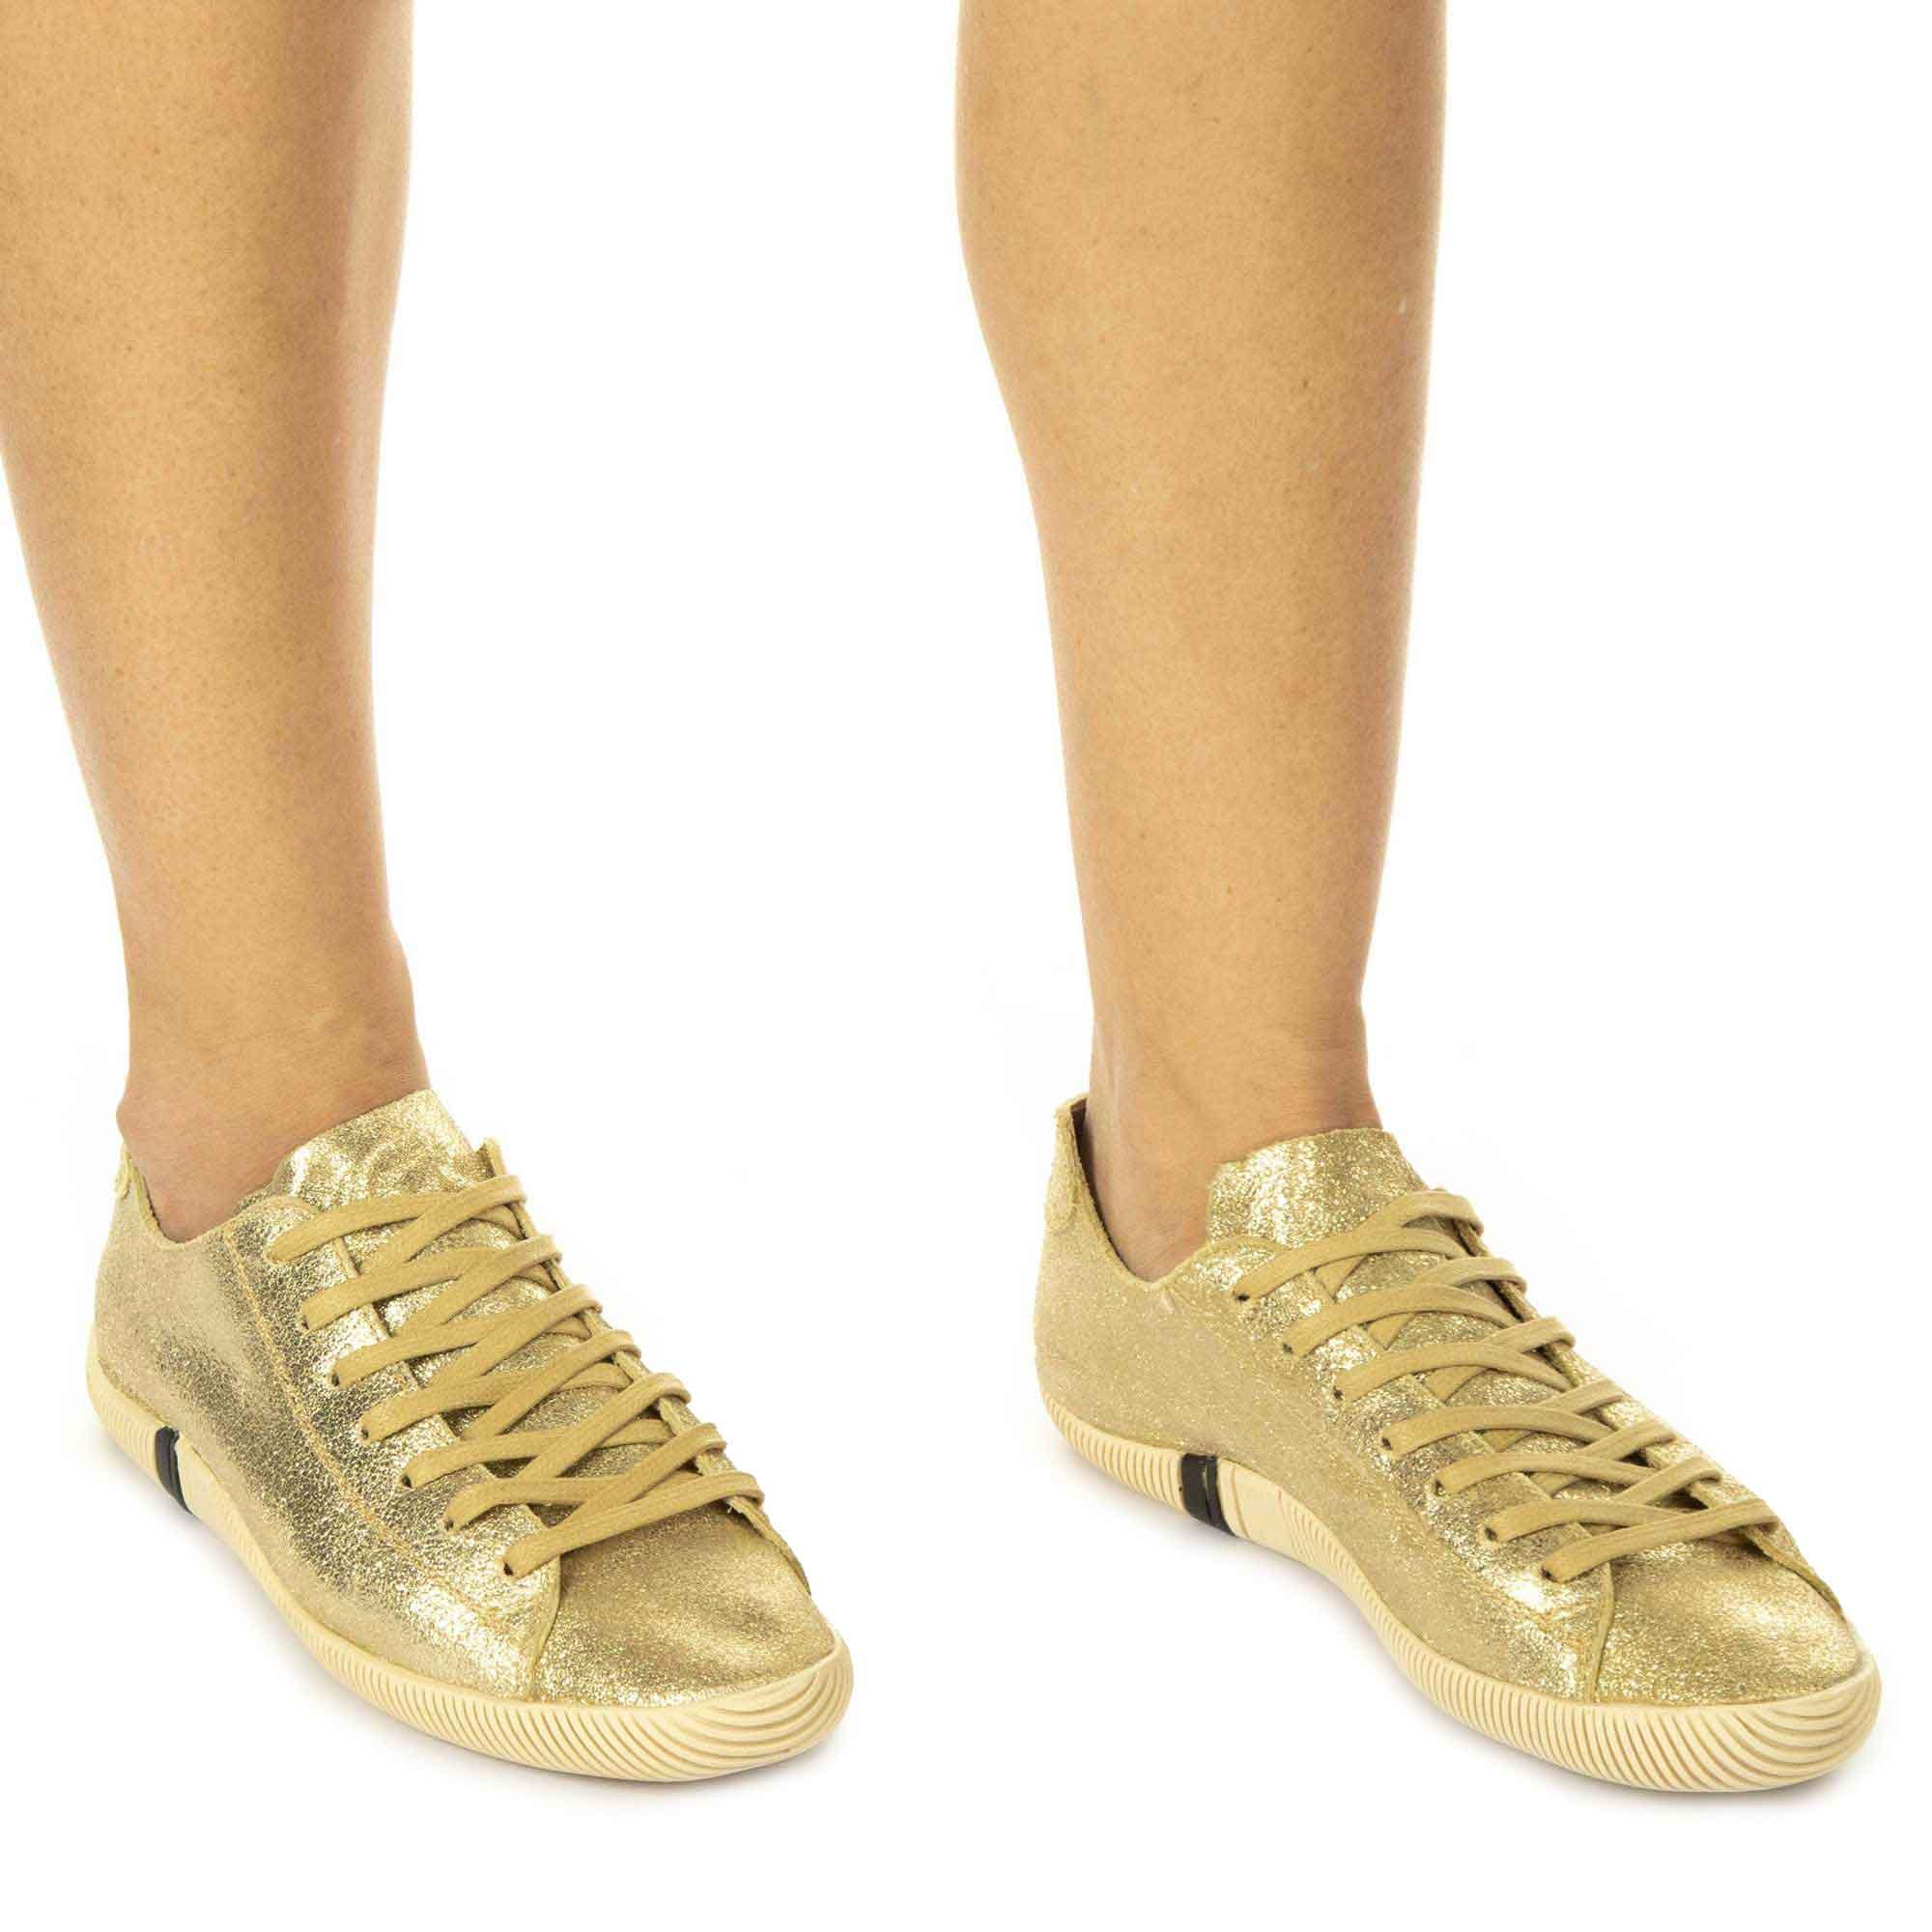 Osklen Sapatênis Arpoador Soft Feminino Ouro